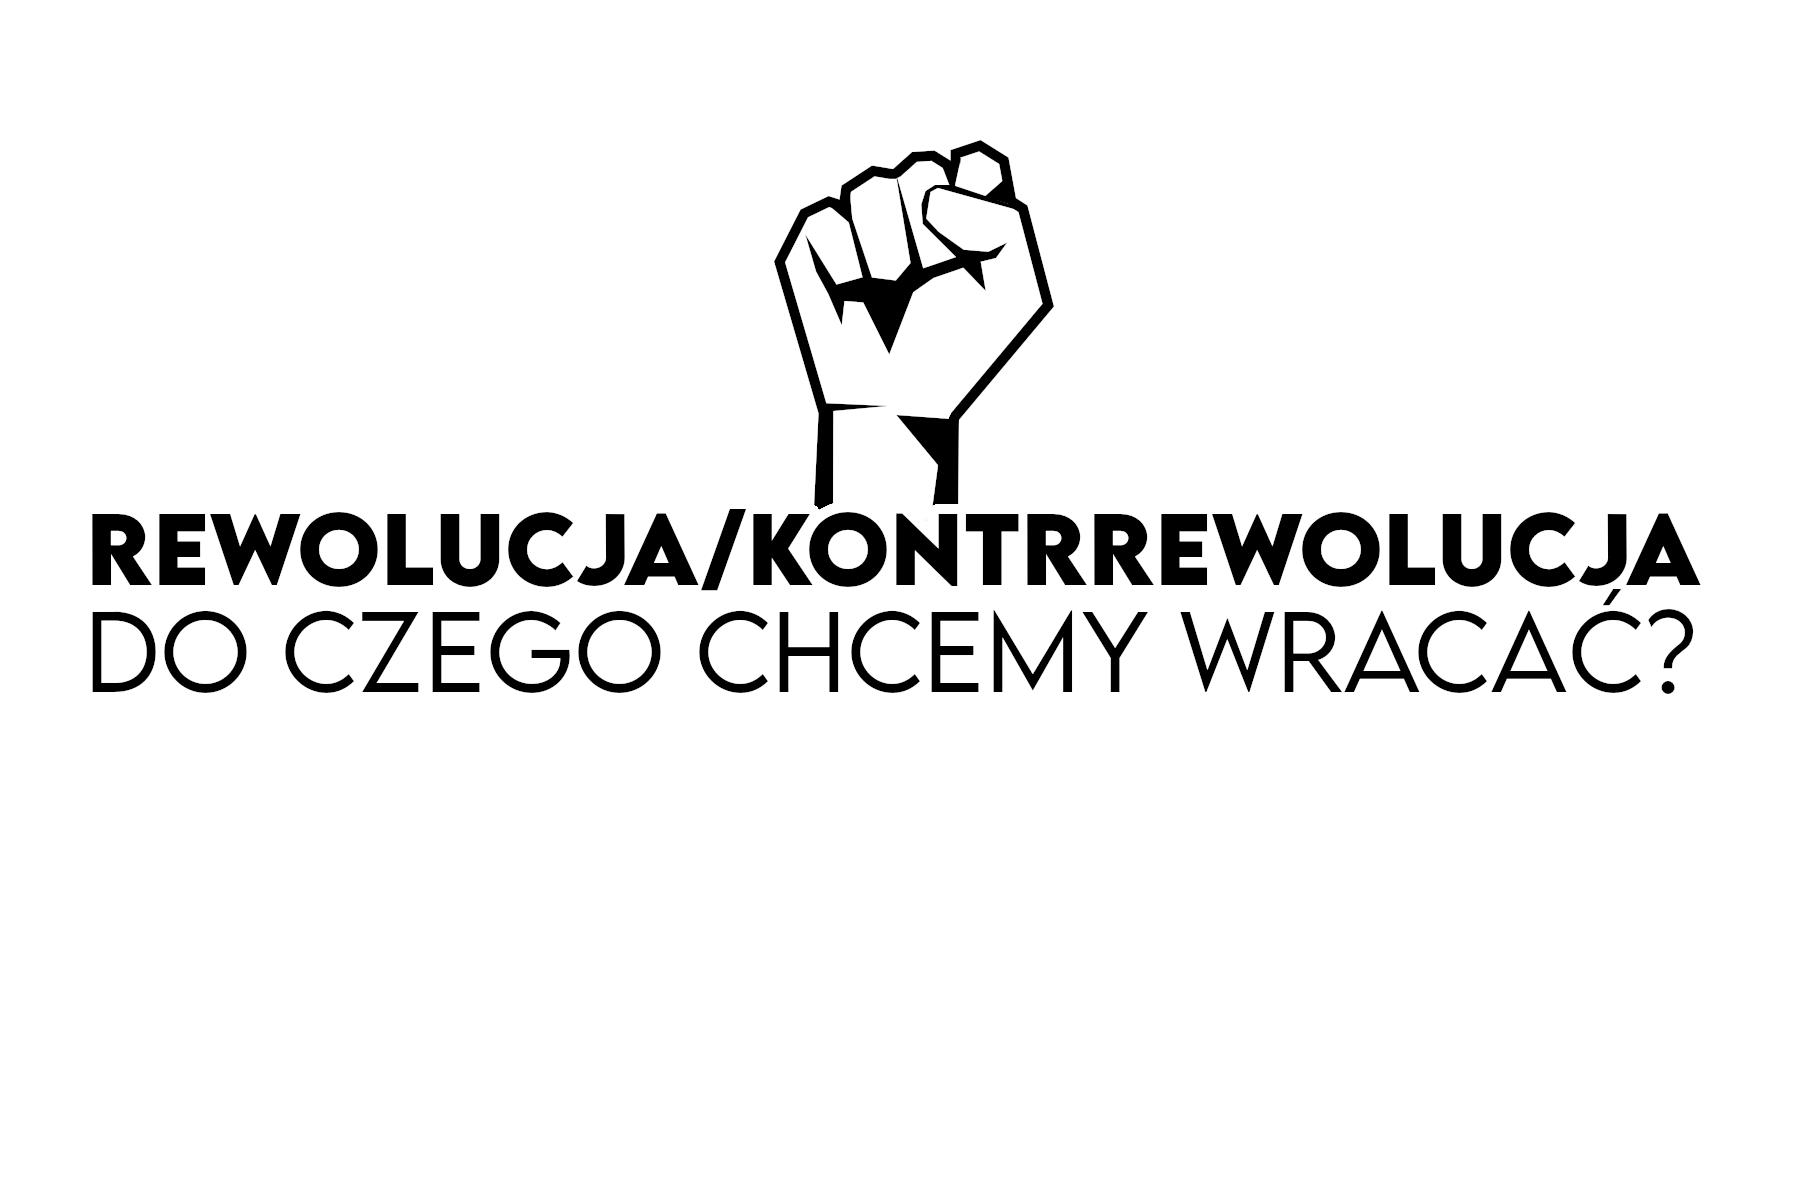 kontrewolucja, rewolucja